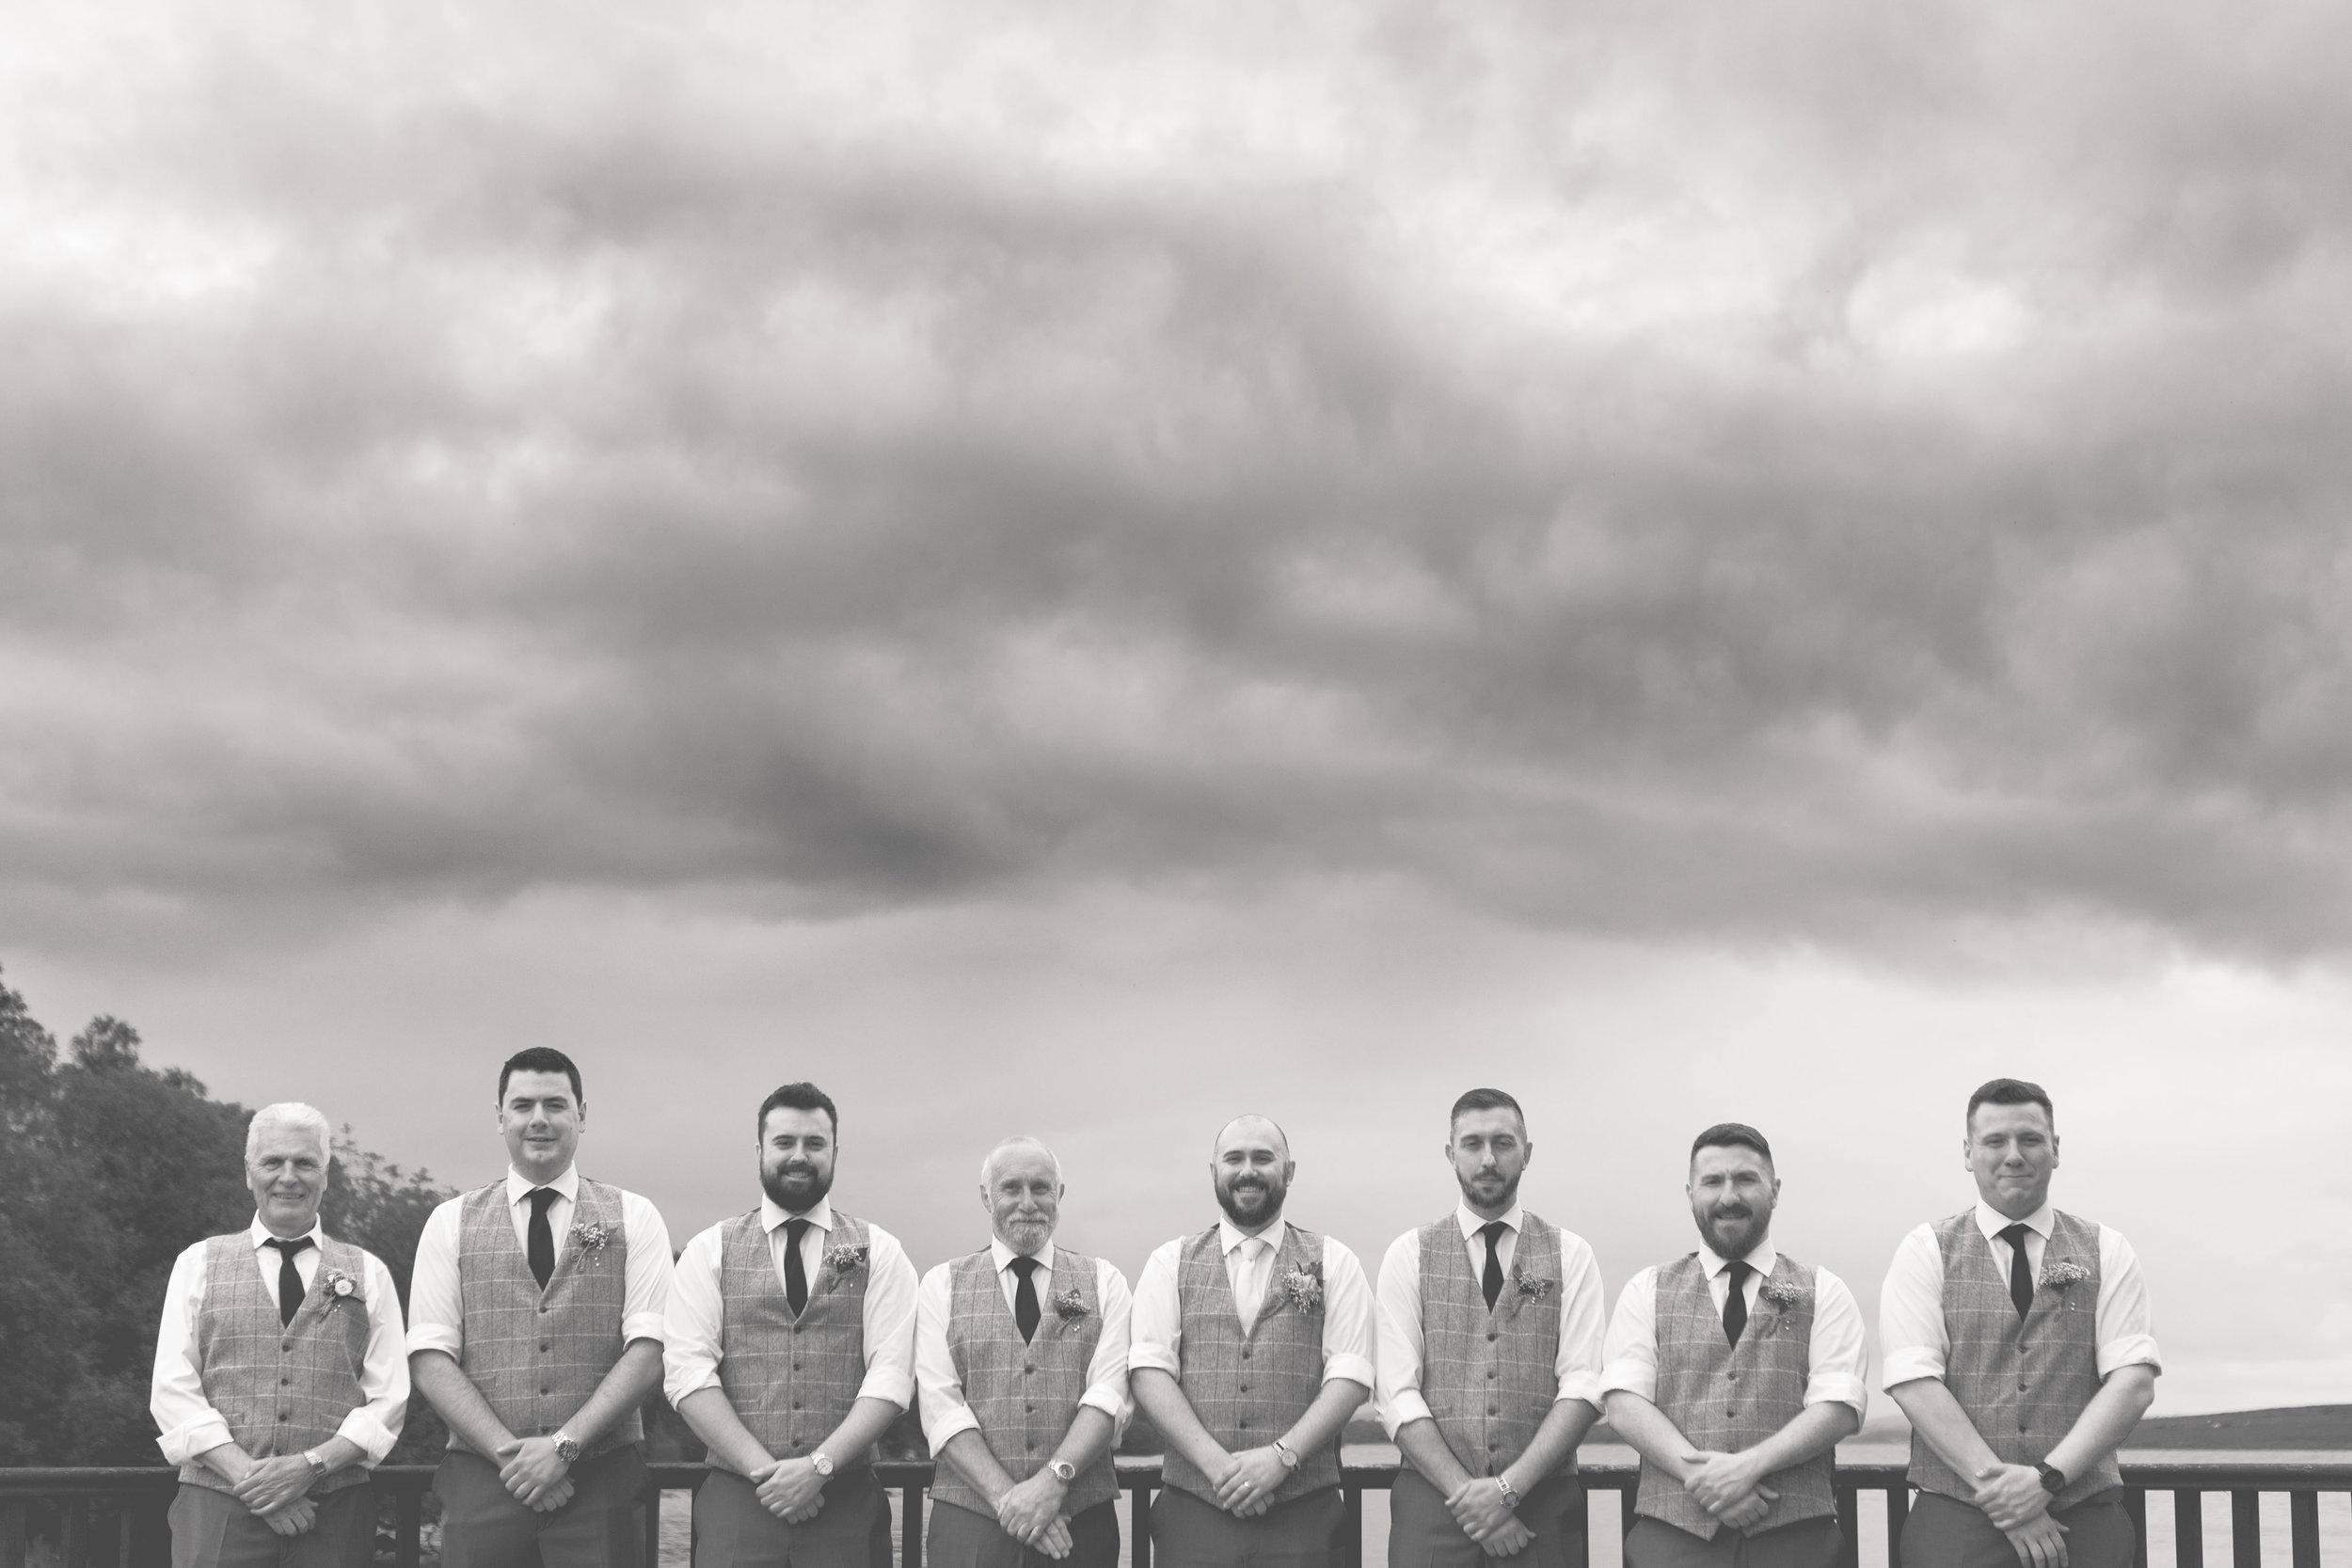 Northern Ireland Wedding Photographer   Brian McEwan Photography   Affordable Wedding Photography Throughout Antrim Down Armagh Tyrone Londonderry Derry Down Fermanagh -4.jpg